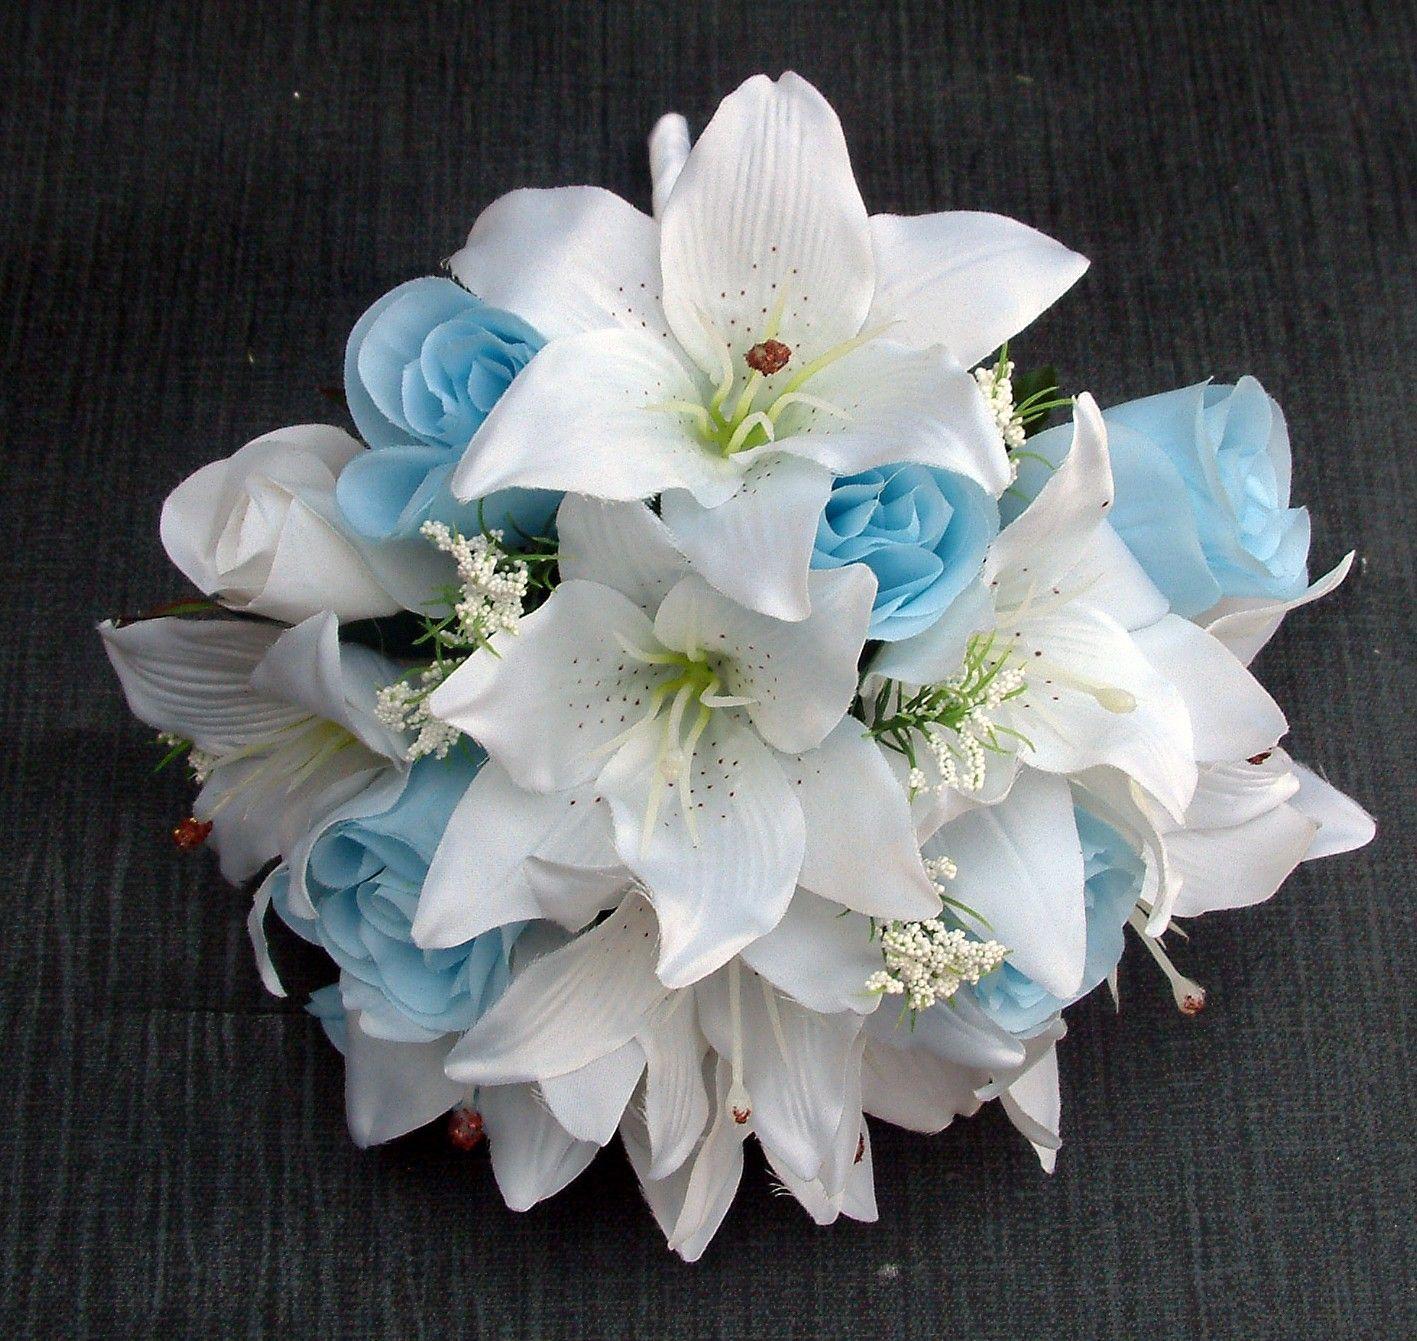 Single rose bridesmaids bouquet artificial light blue for White and blue flower bouquet